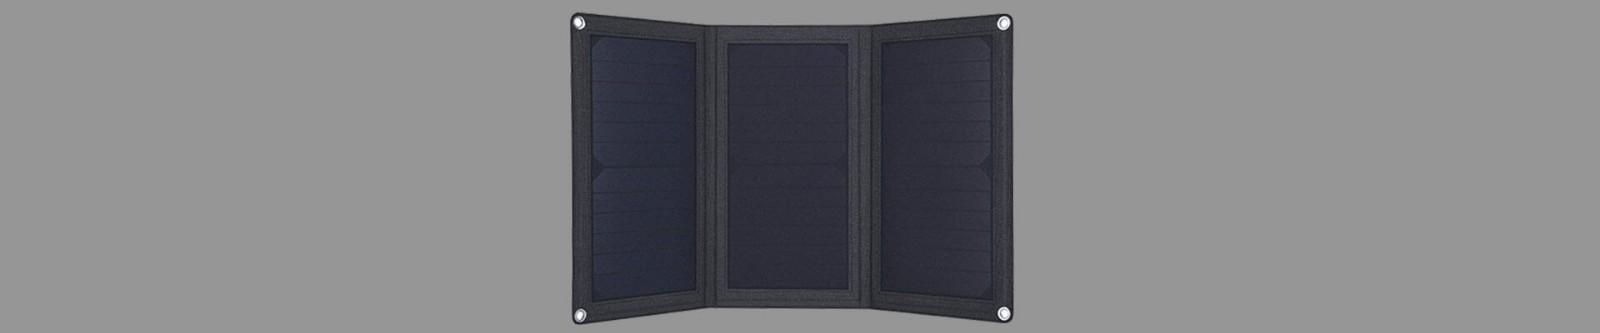 pb-p25-banner_%281%29.jpg